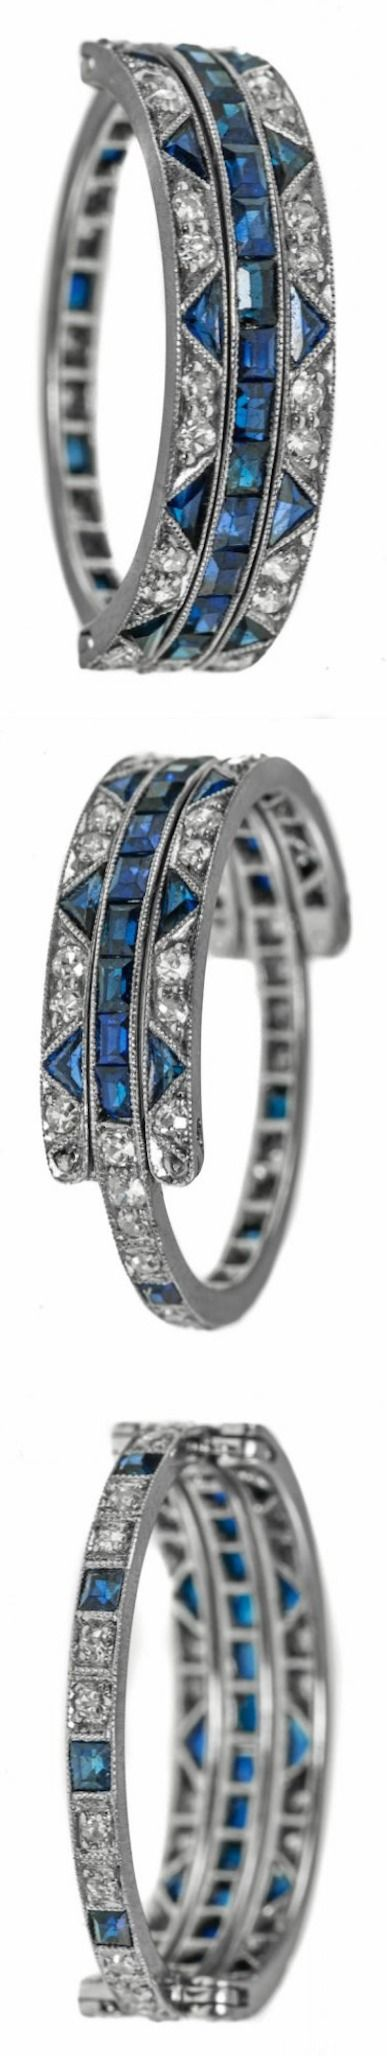 ART DECO PLATINUM SAPPHIRE AND DIAMOND RING An early Art deco platinum sapphire and diamond hinged flip ring.